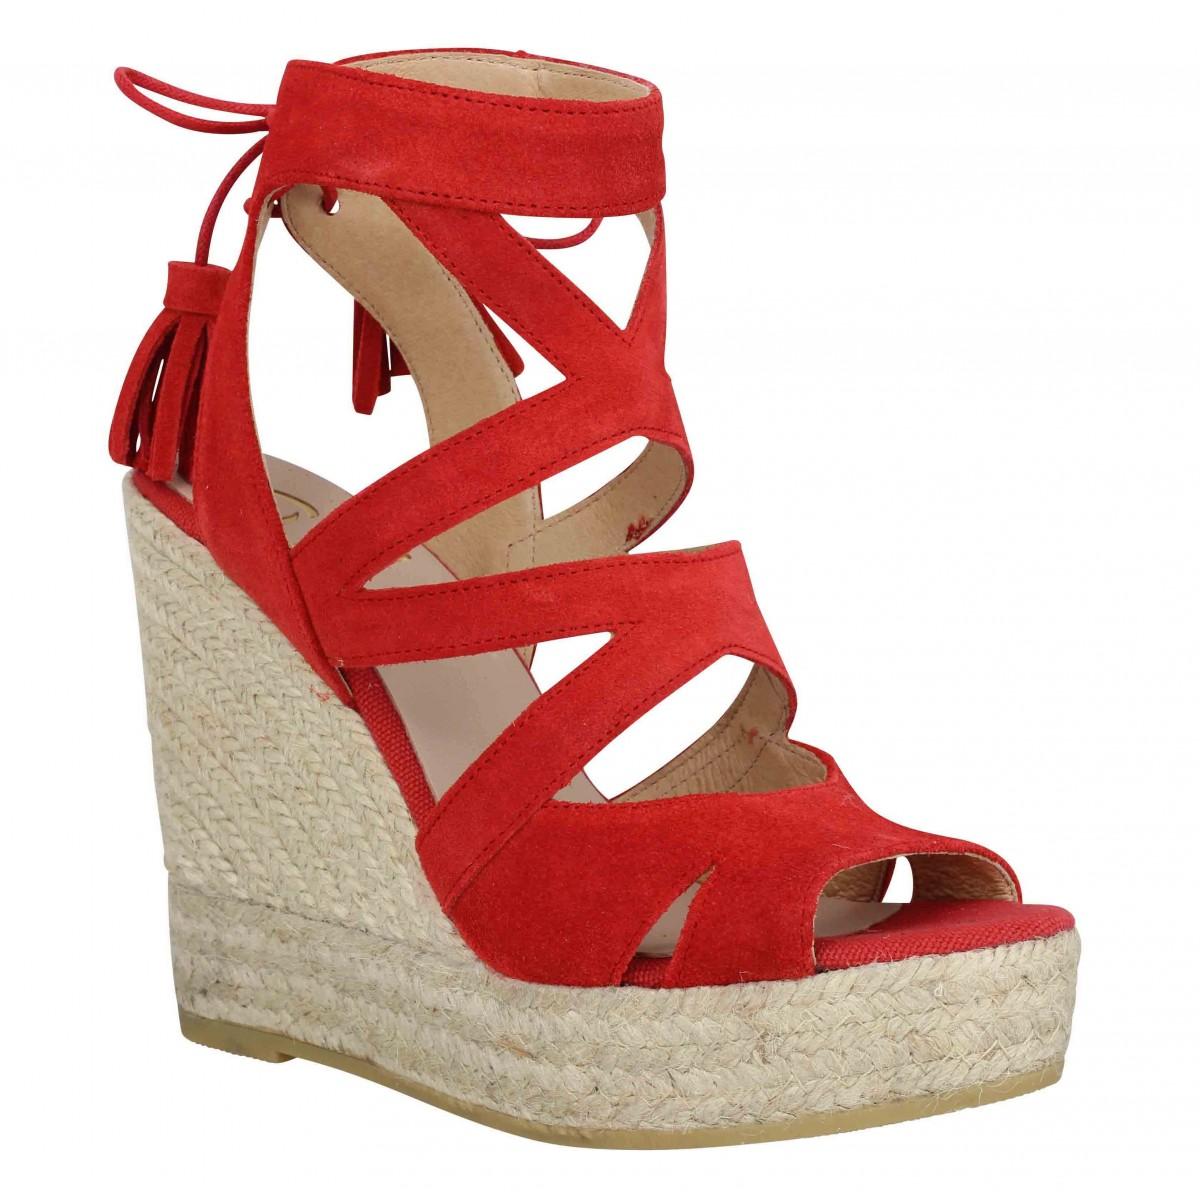 Sandales talons KANNA 6022 velours Femme Rouge